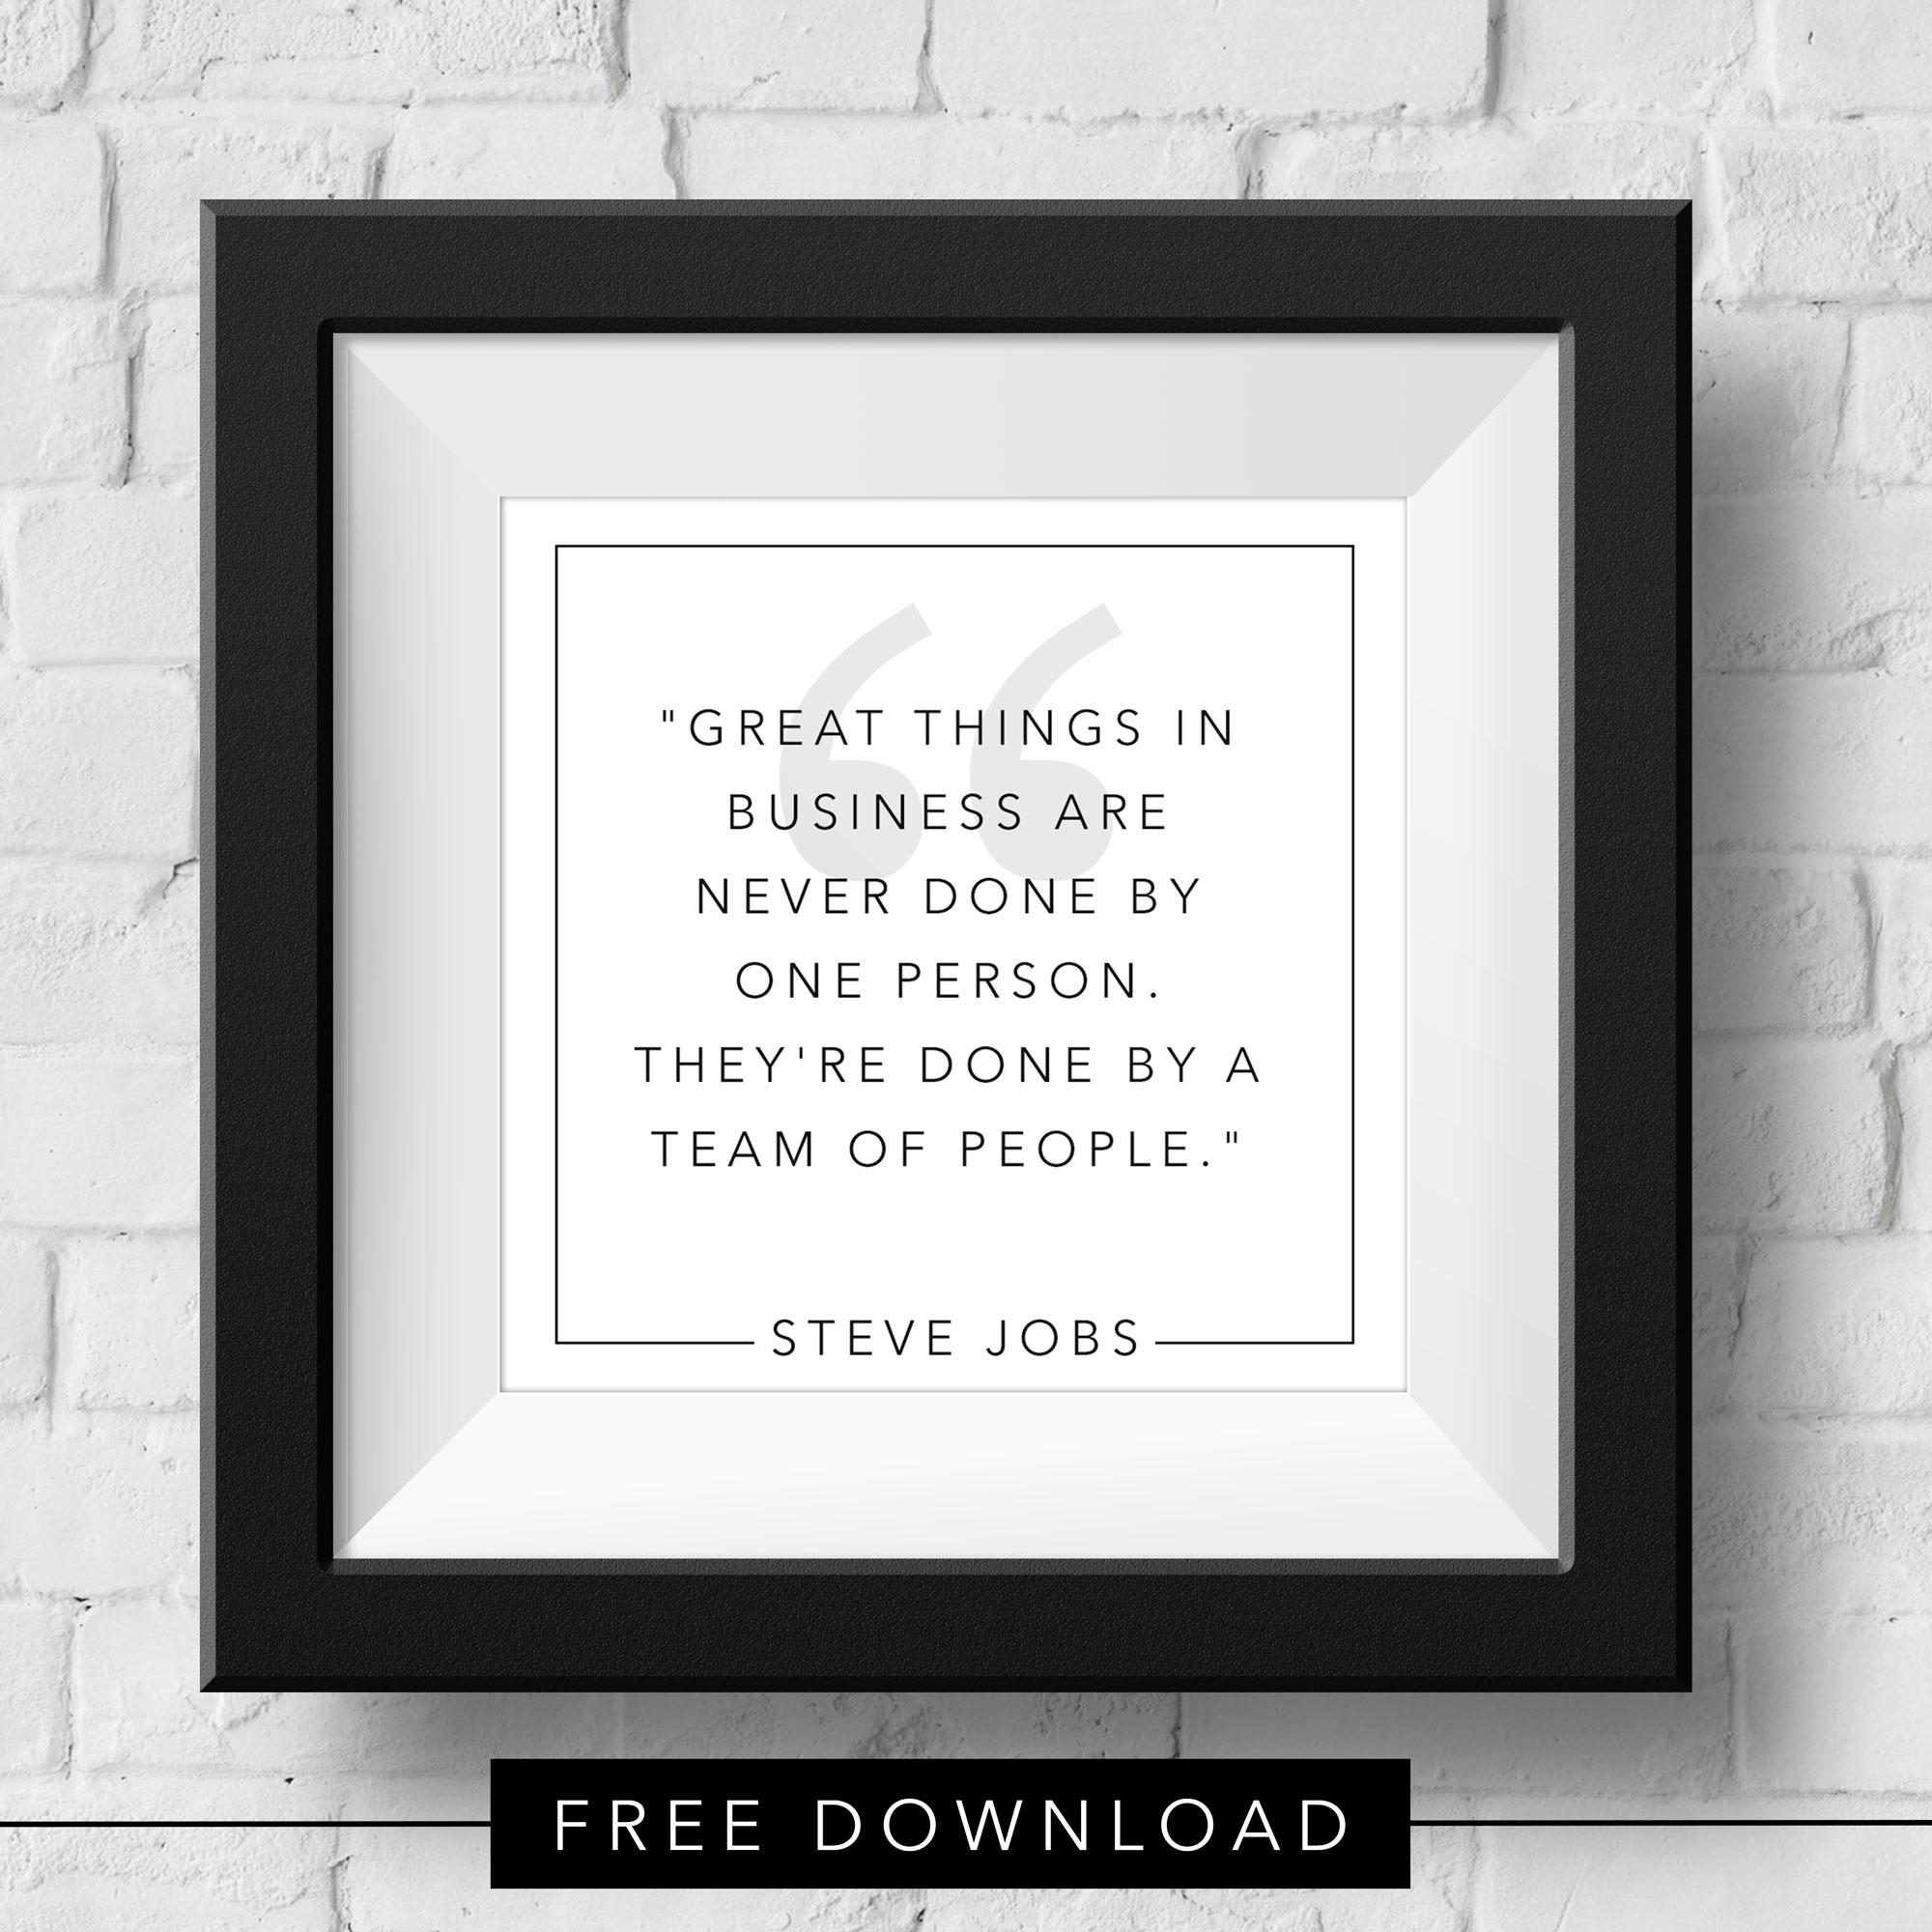 teamwork-steve-jobs-free-download